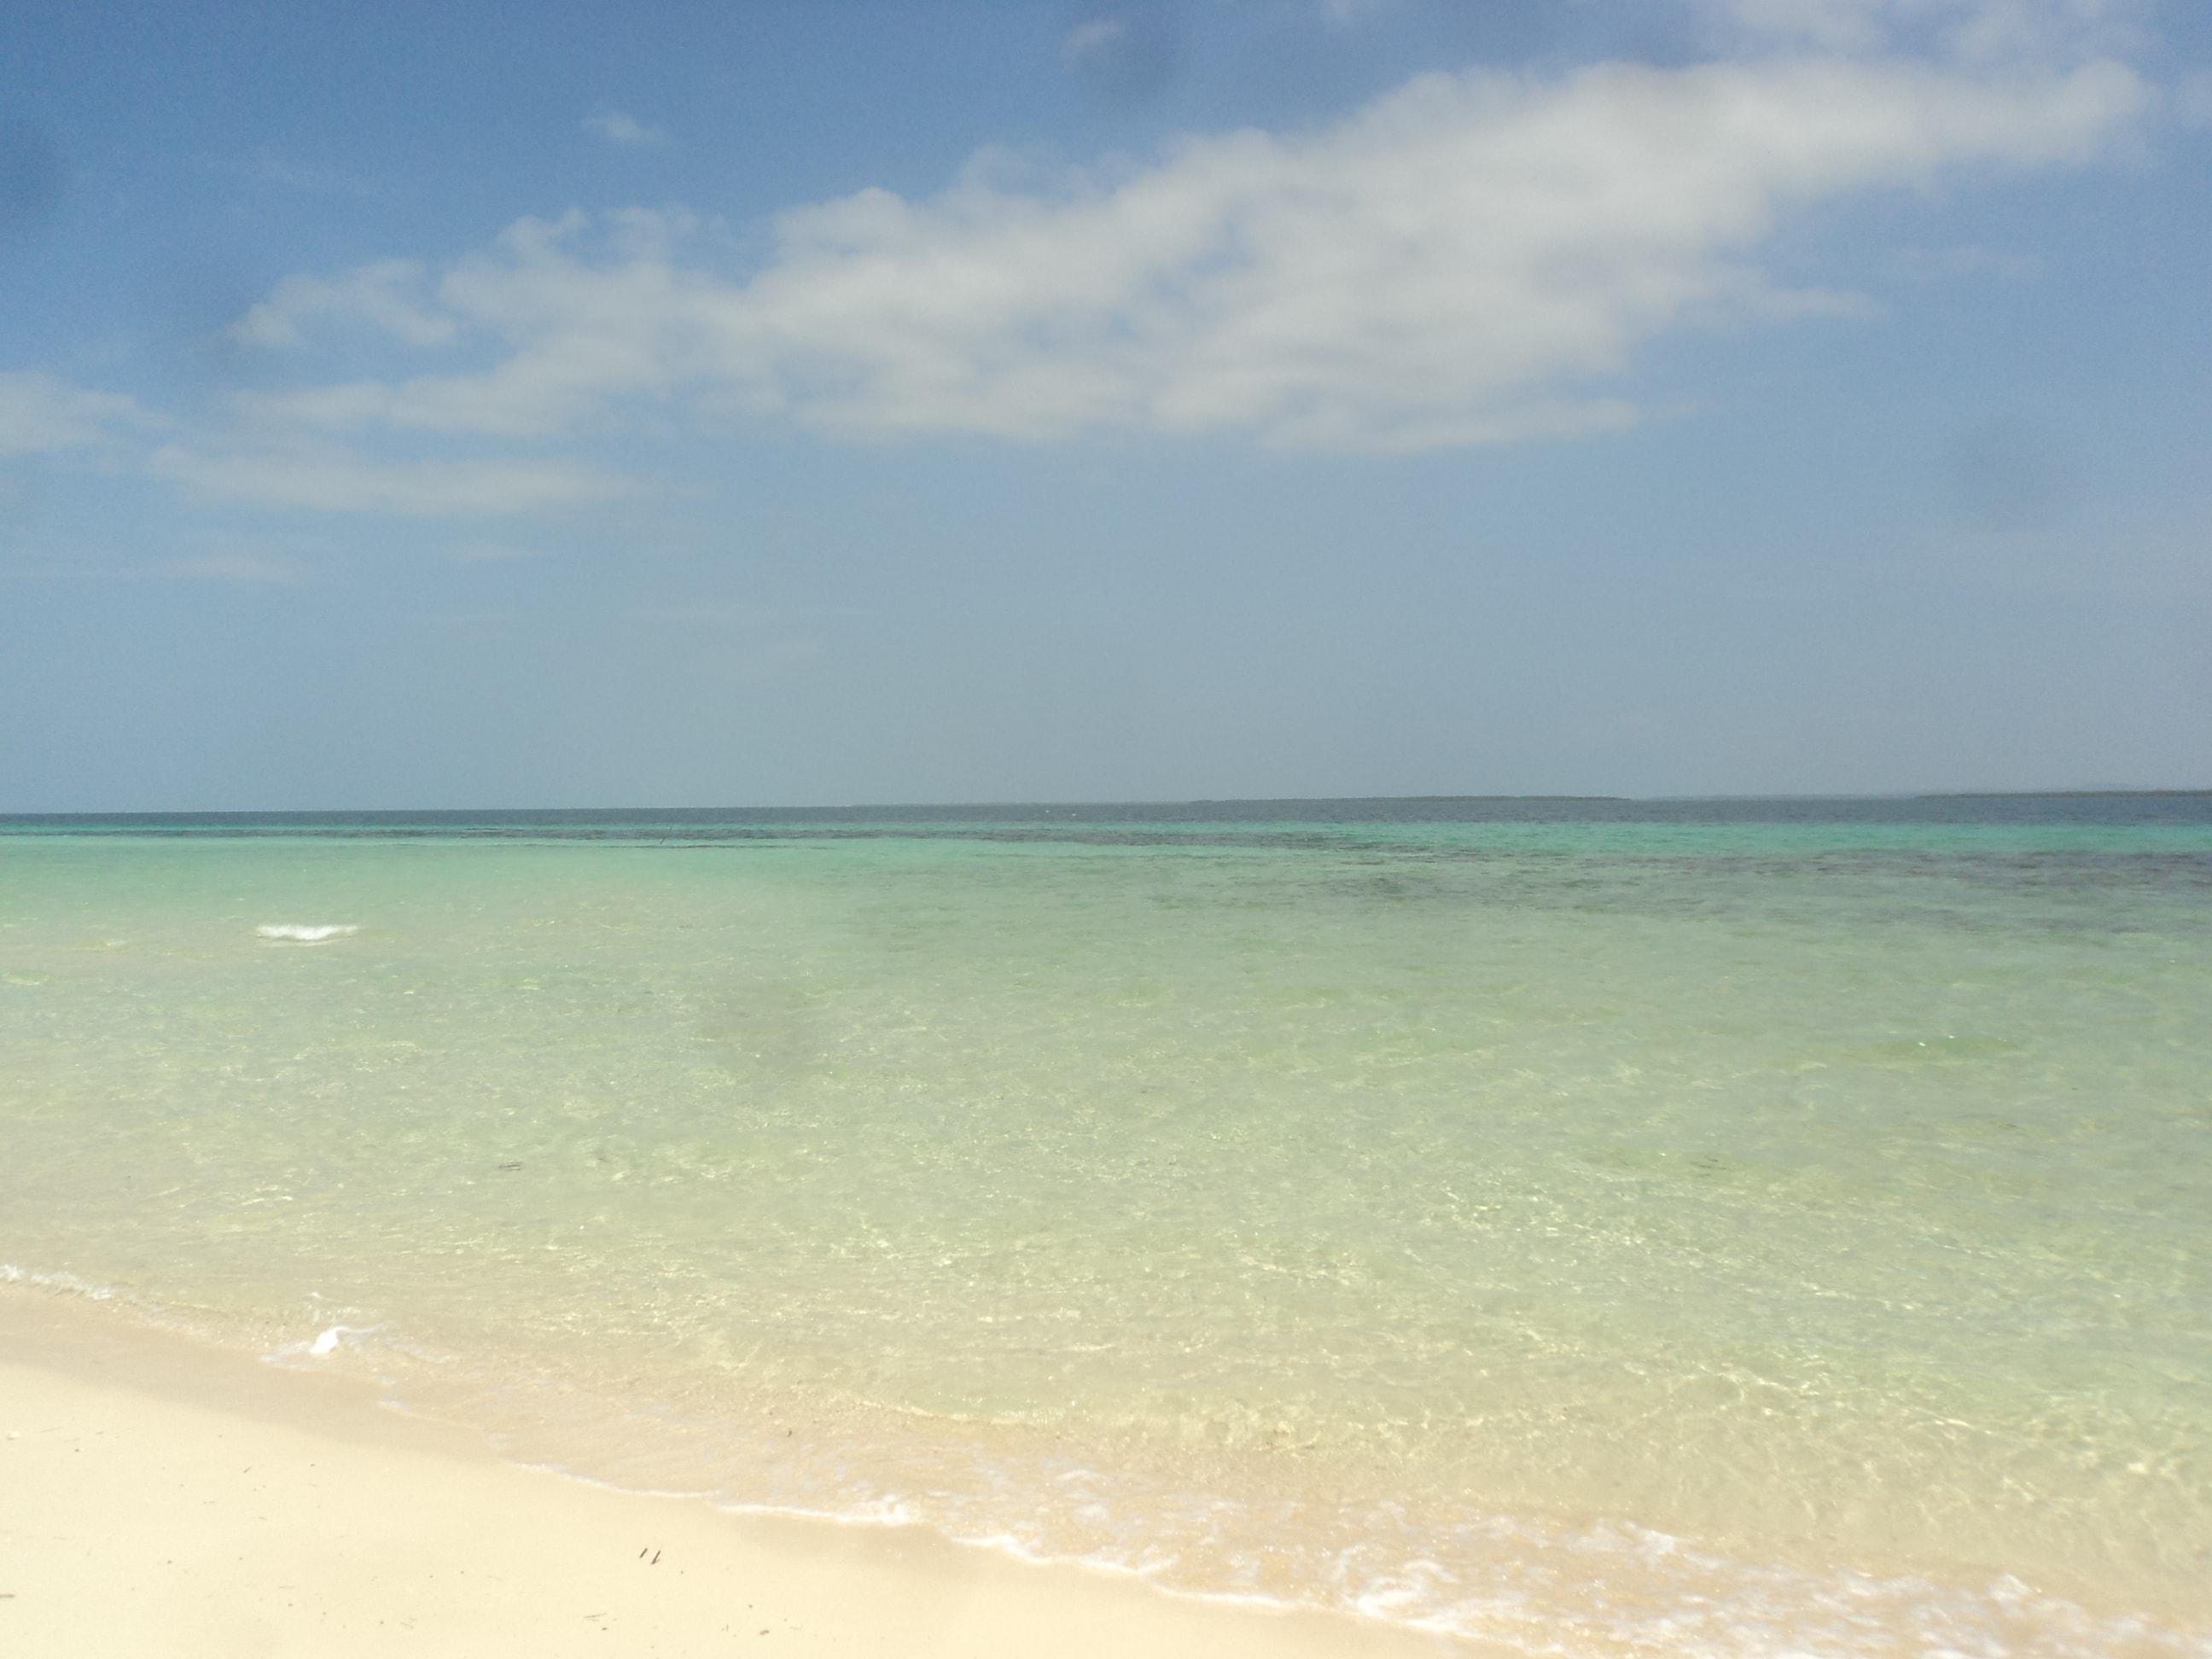 Playa paradisiaca .